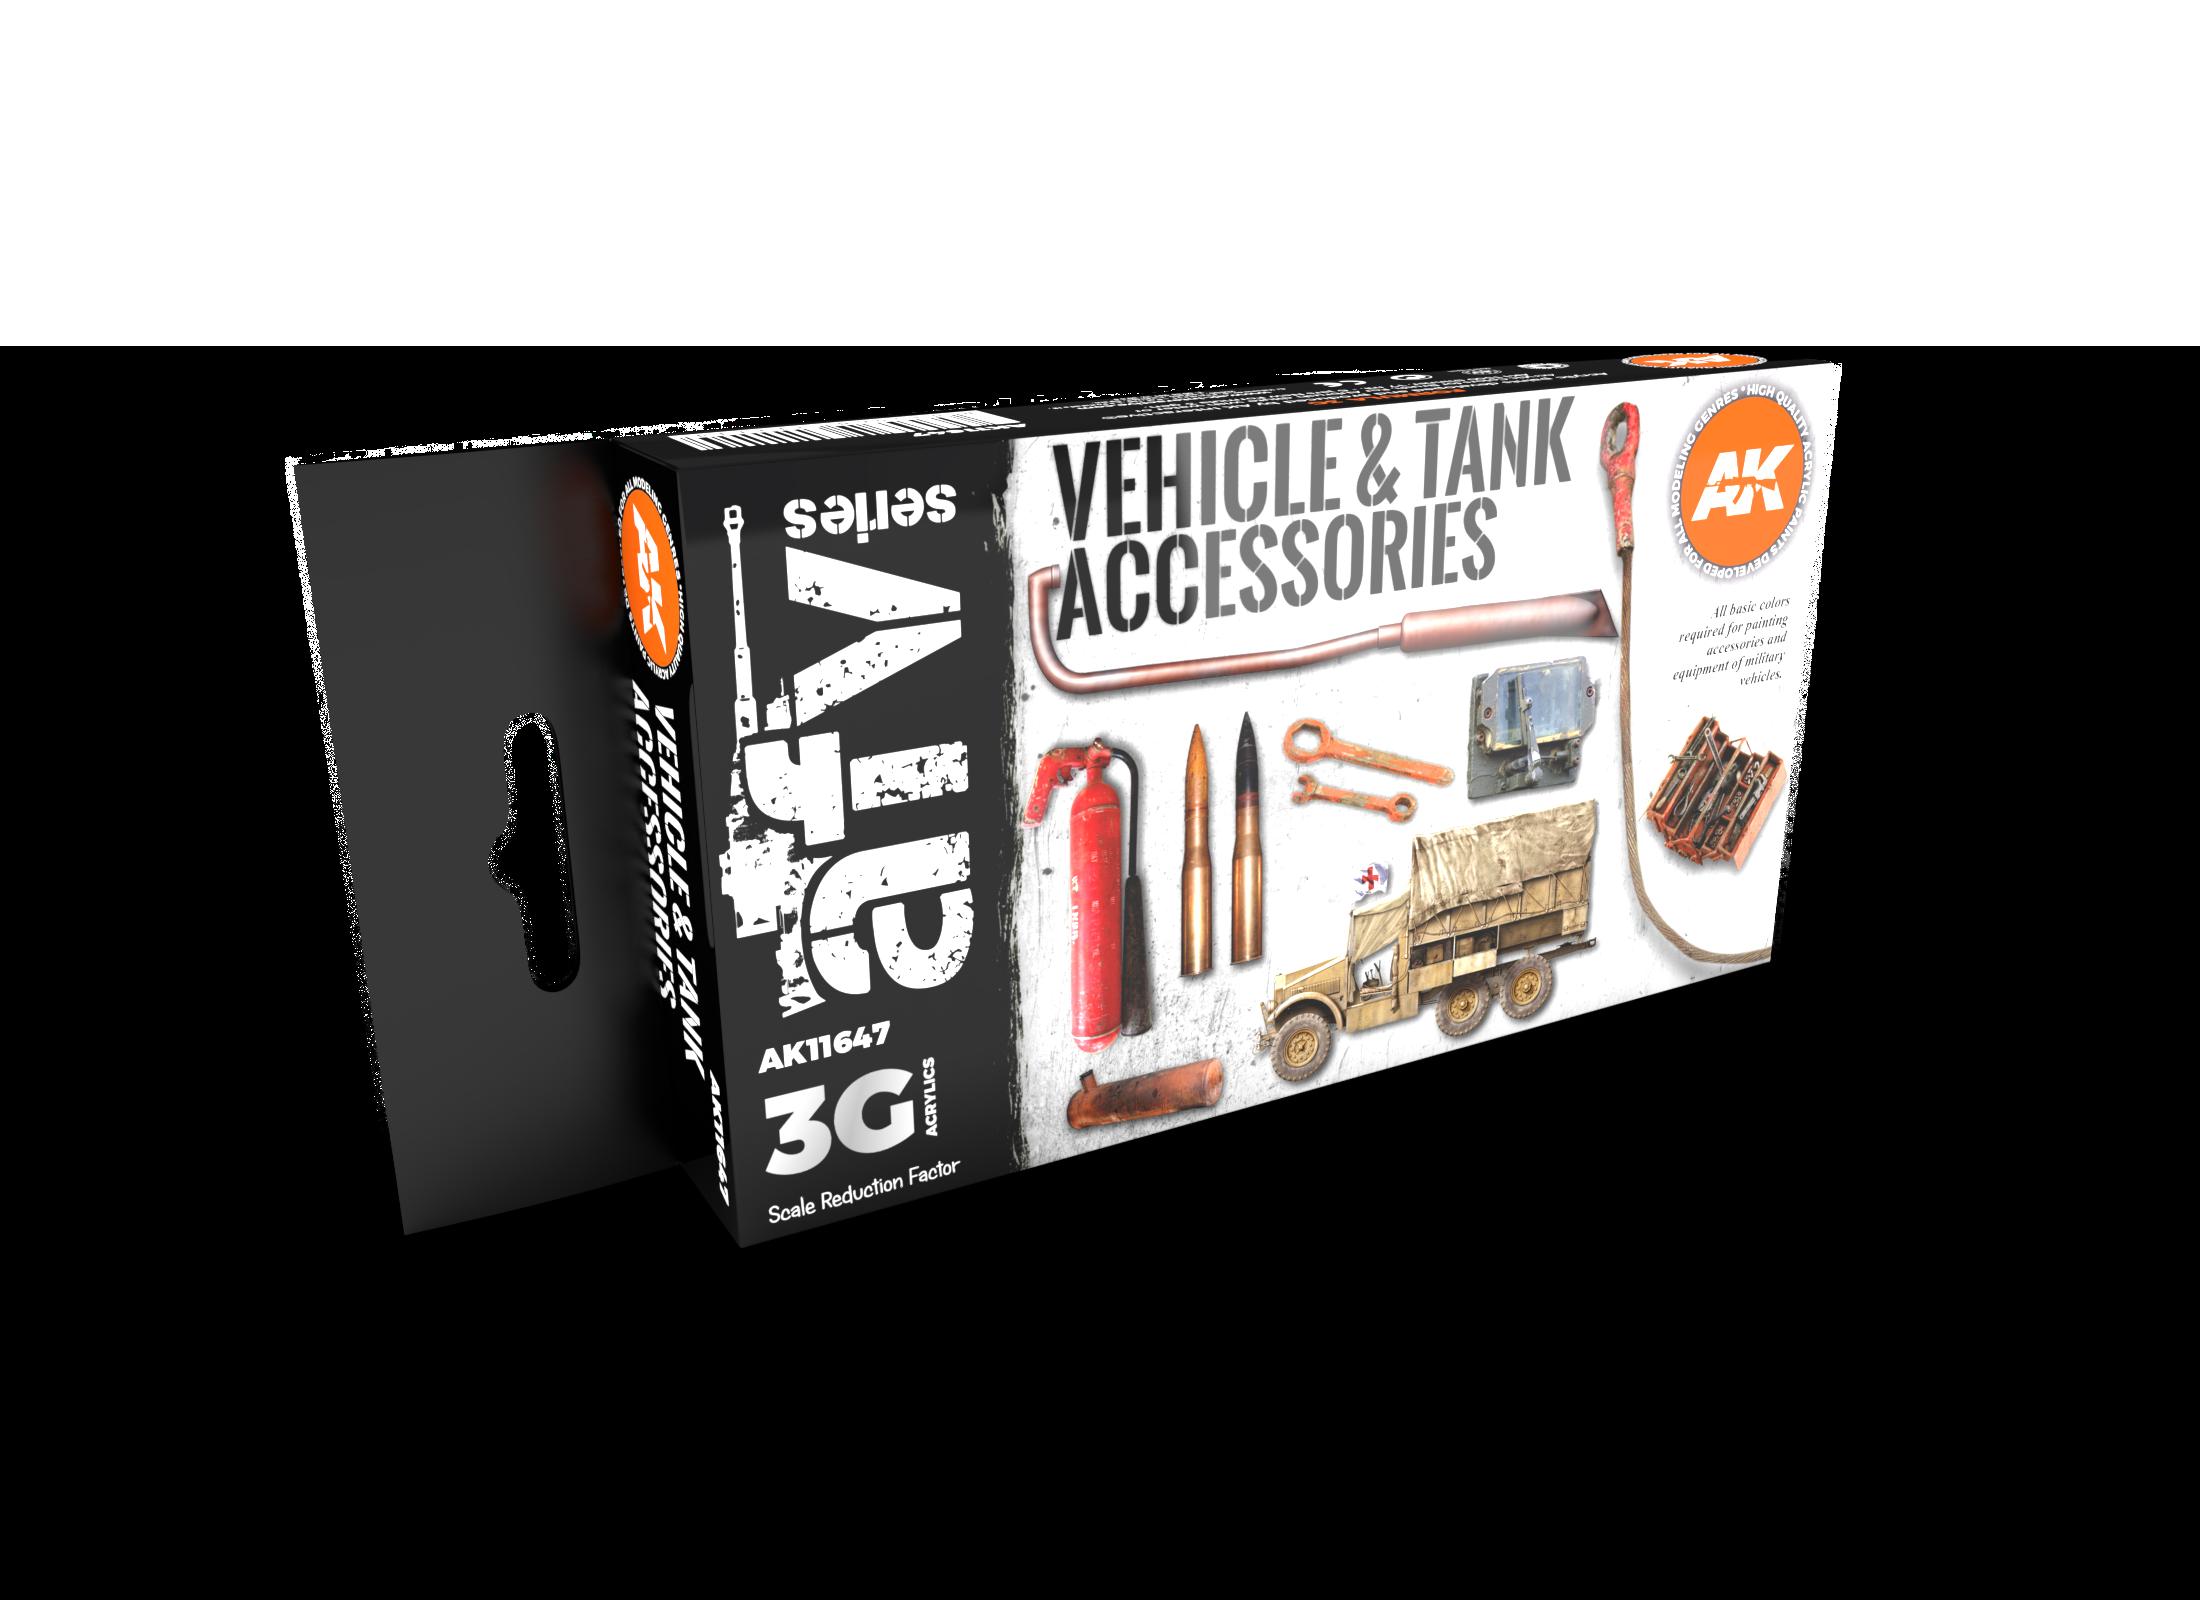 AK Interactive 3G Tank Accessories